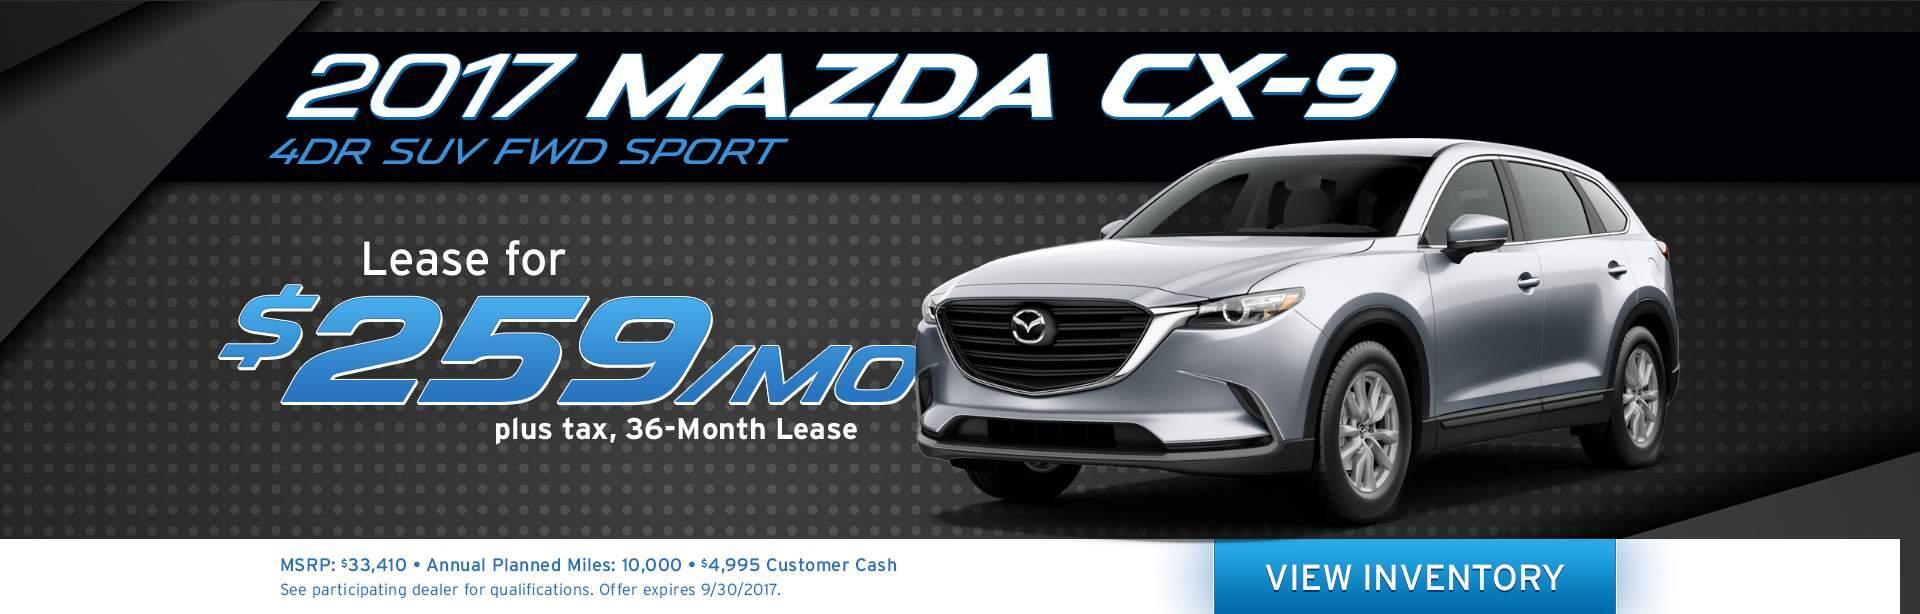 Charming Mazda Dealership Las Vegas Nv Used Cars Cardinaleway Mazda